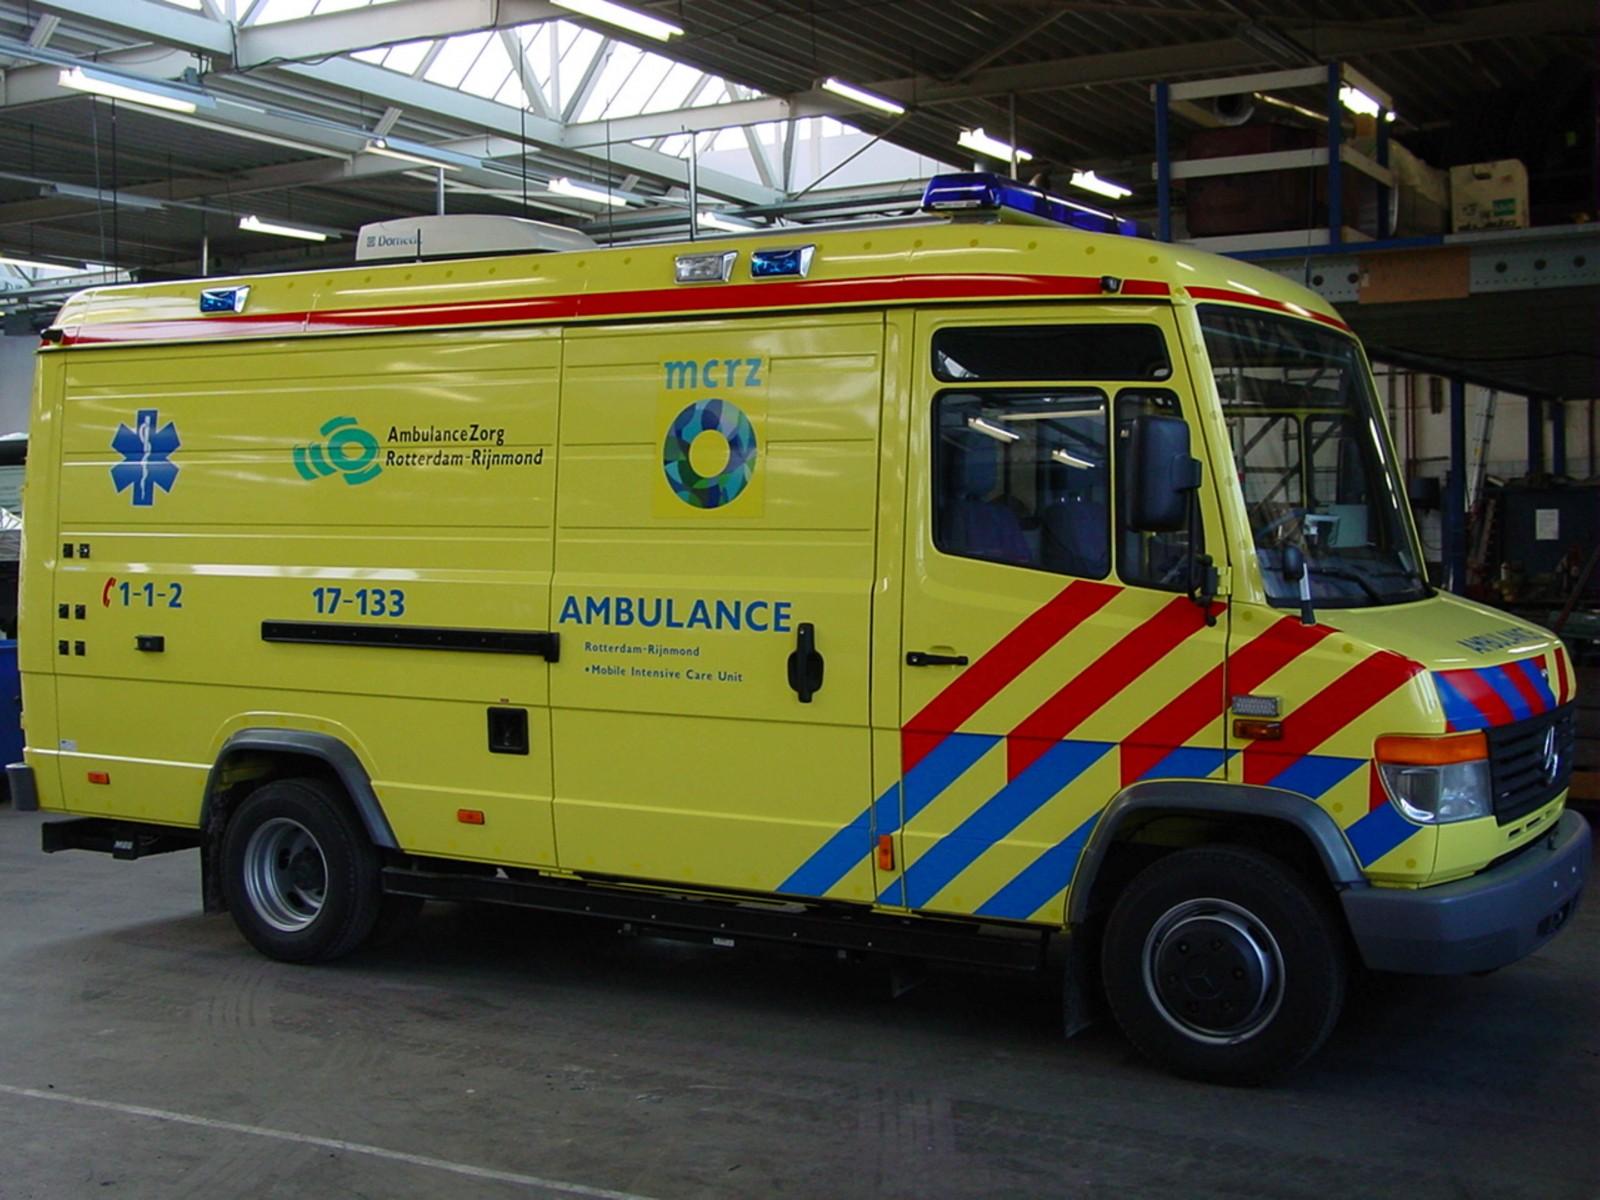 Ambulancezorg rotterdam rijnmond bios groep start proef for Bios rotterdam